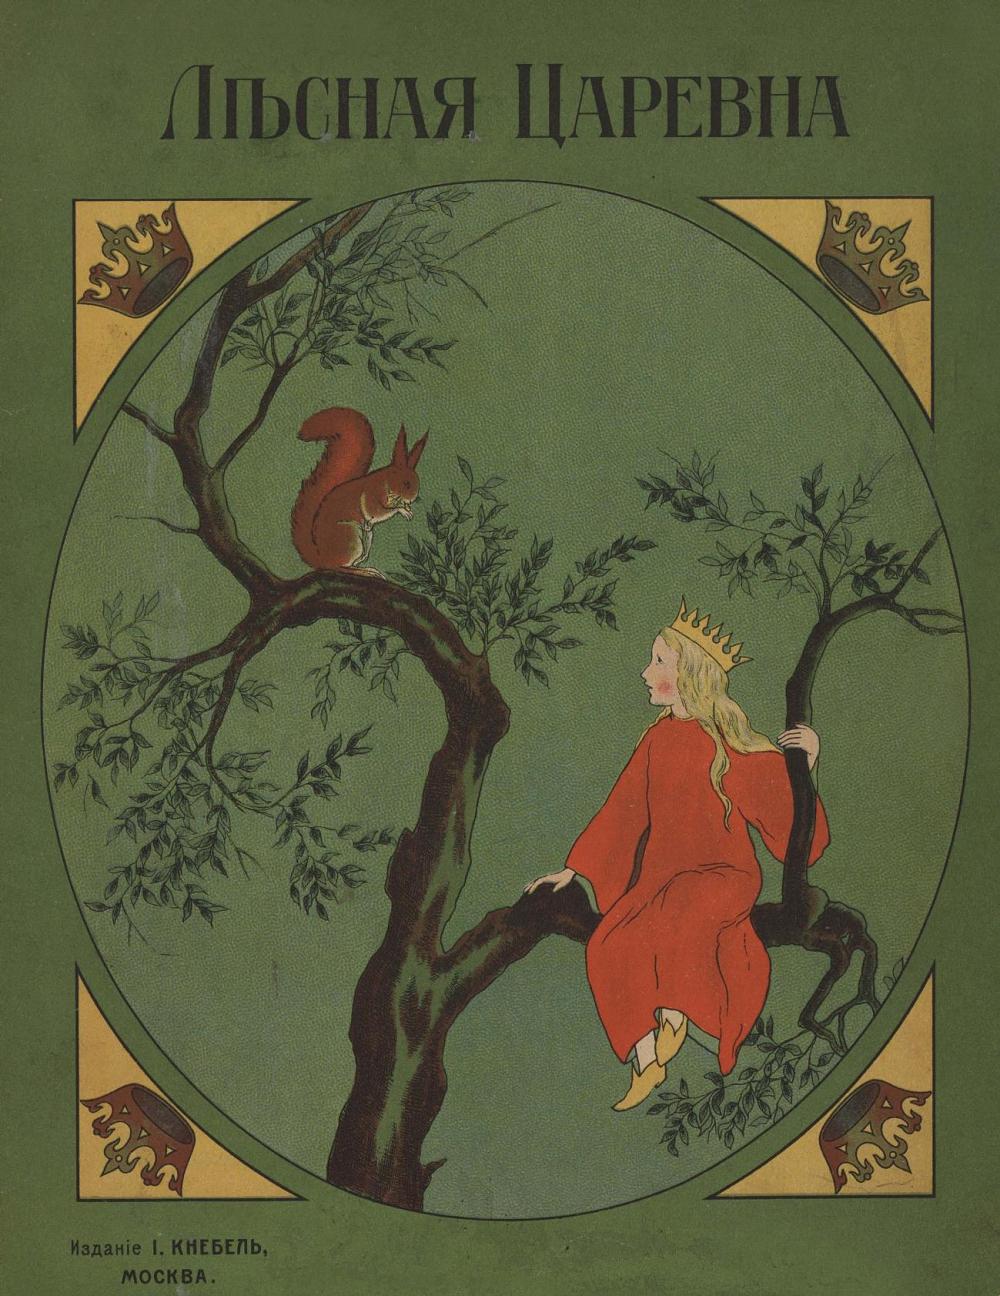 Сибилл фон Ольферс. Лесная царевна (Сказка в стихах) 1910